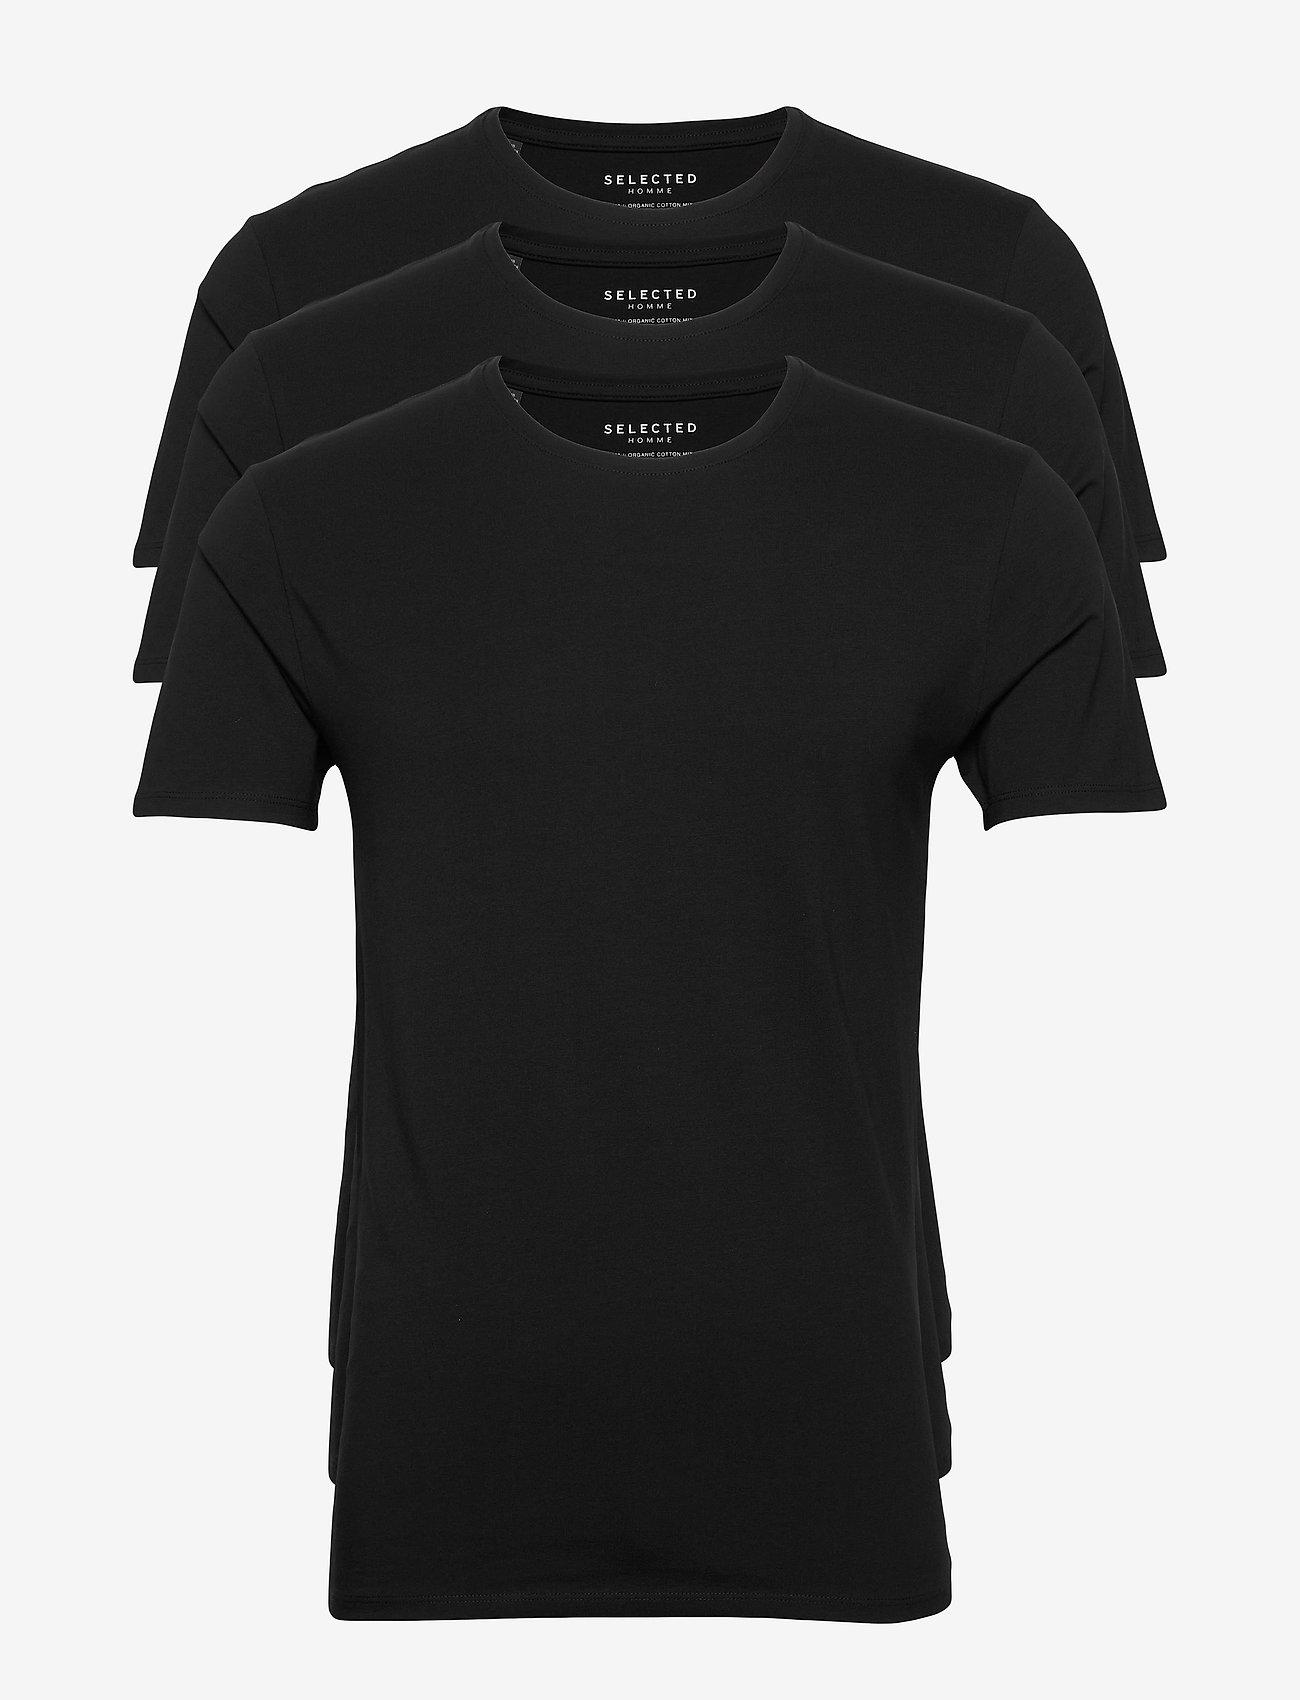 Selected Homme - SLHNEWPIMA SS O-NECK TEE B 3 PACK - basic t-shirts - black - 0